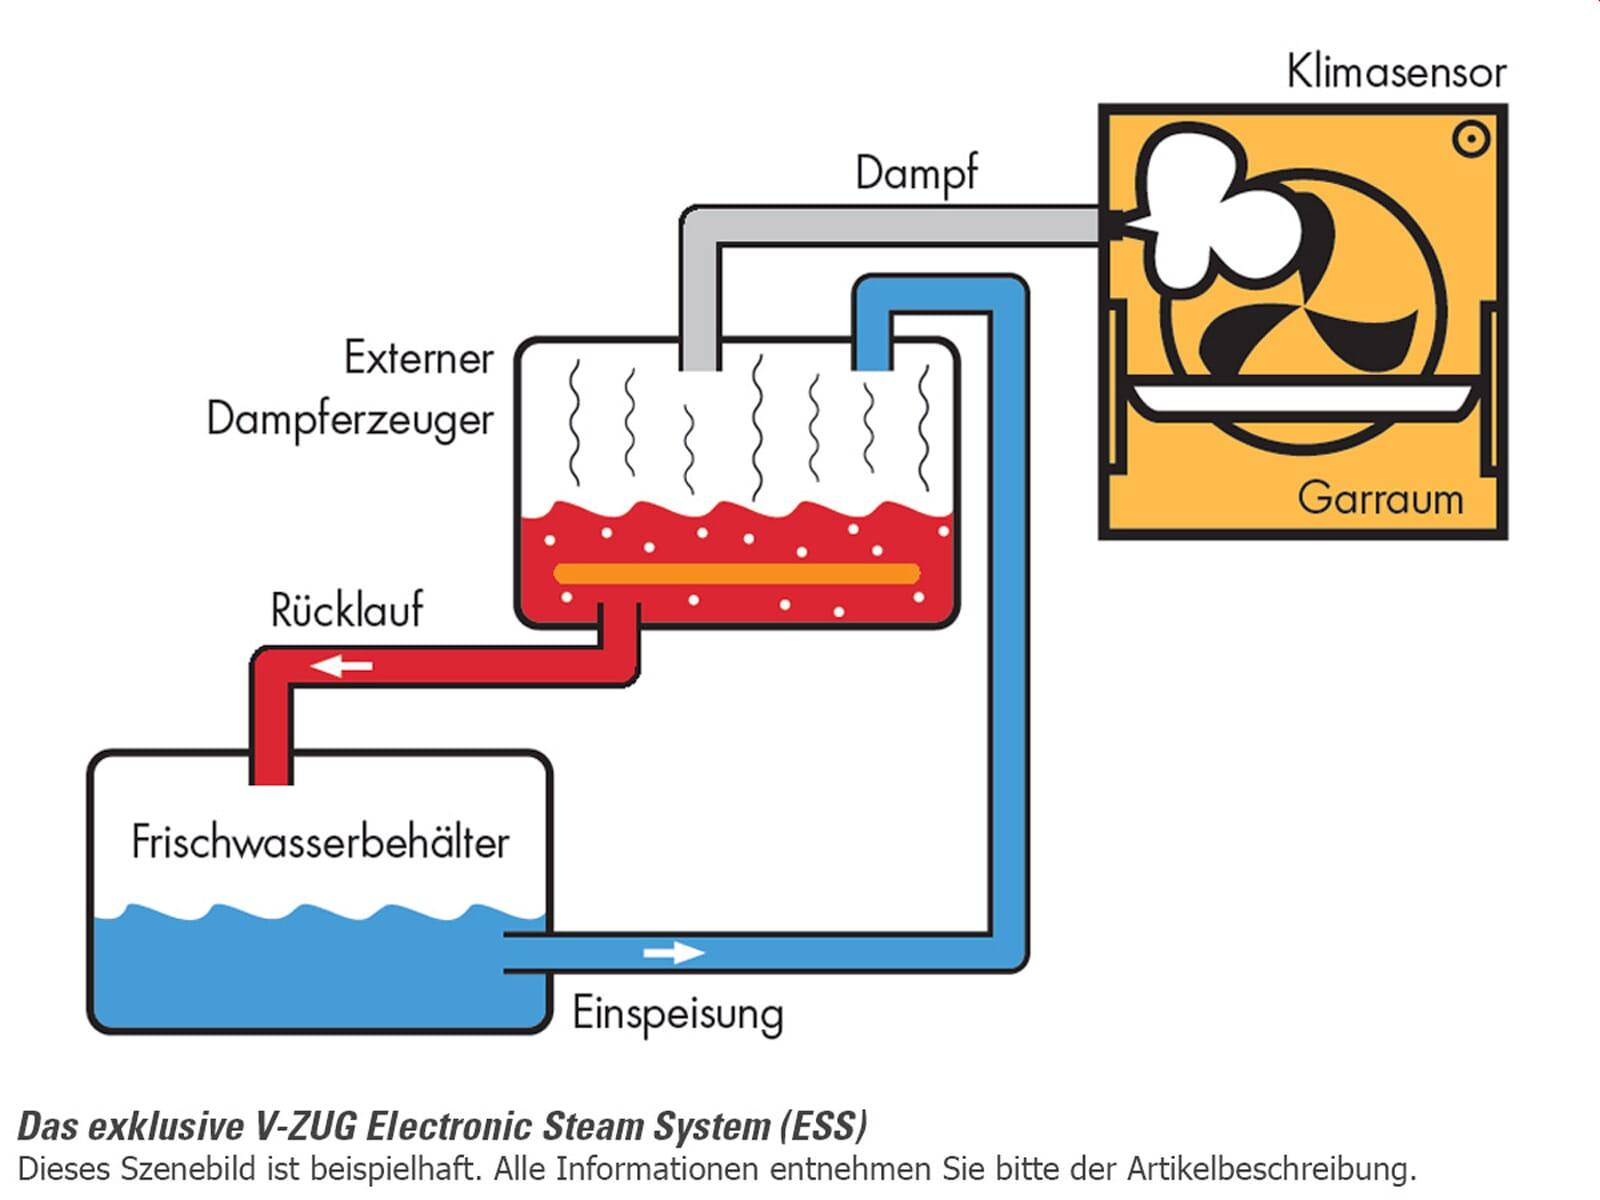 V-ZUG Combair-Steam SE 60 Dampfgar-Backofen ChromeClass